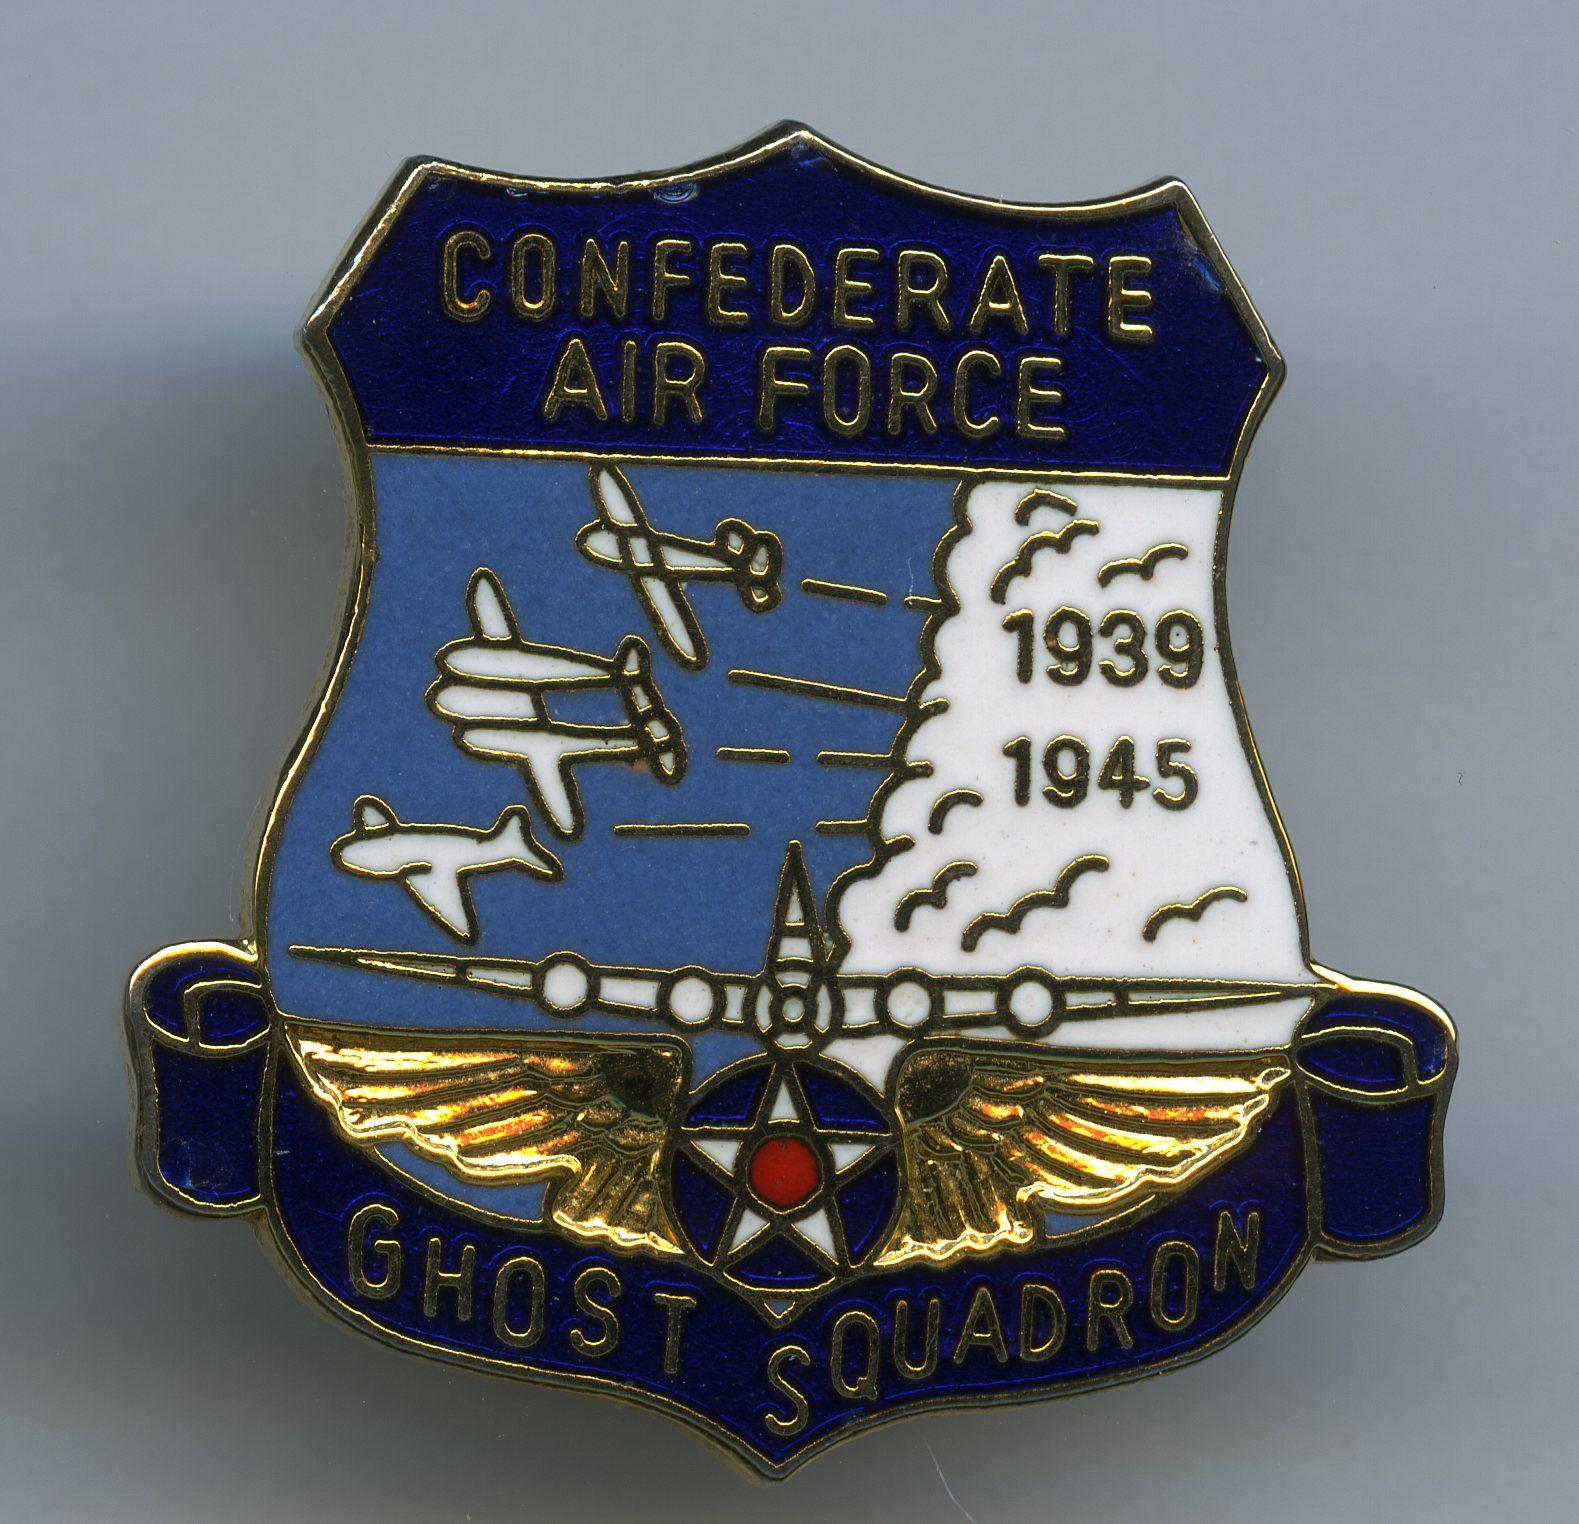 Confederate air force ghost squadron confederate air